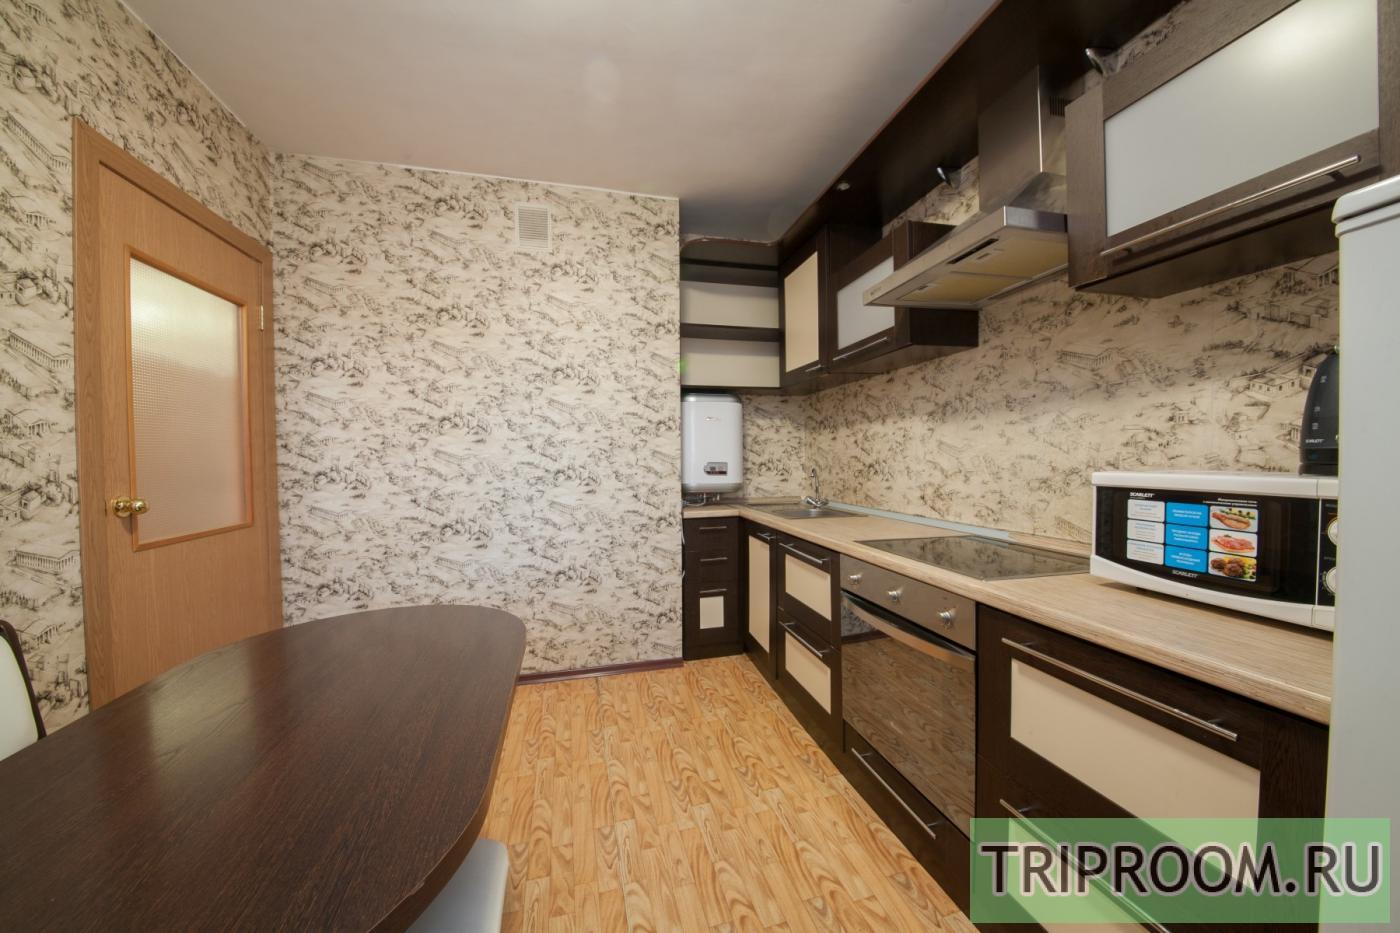 1-комнатная квартира посуточно (вариант № 35185), ул. Алексеева улица, фото № 6